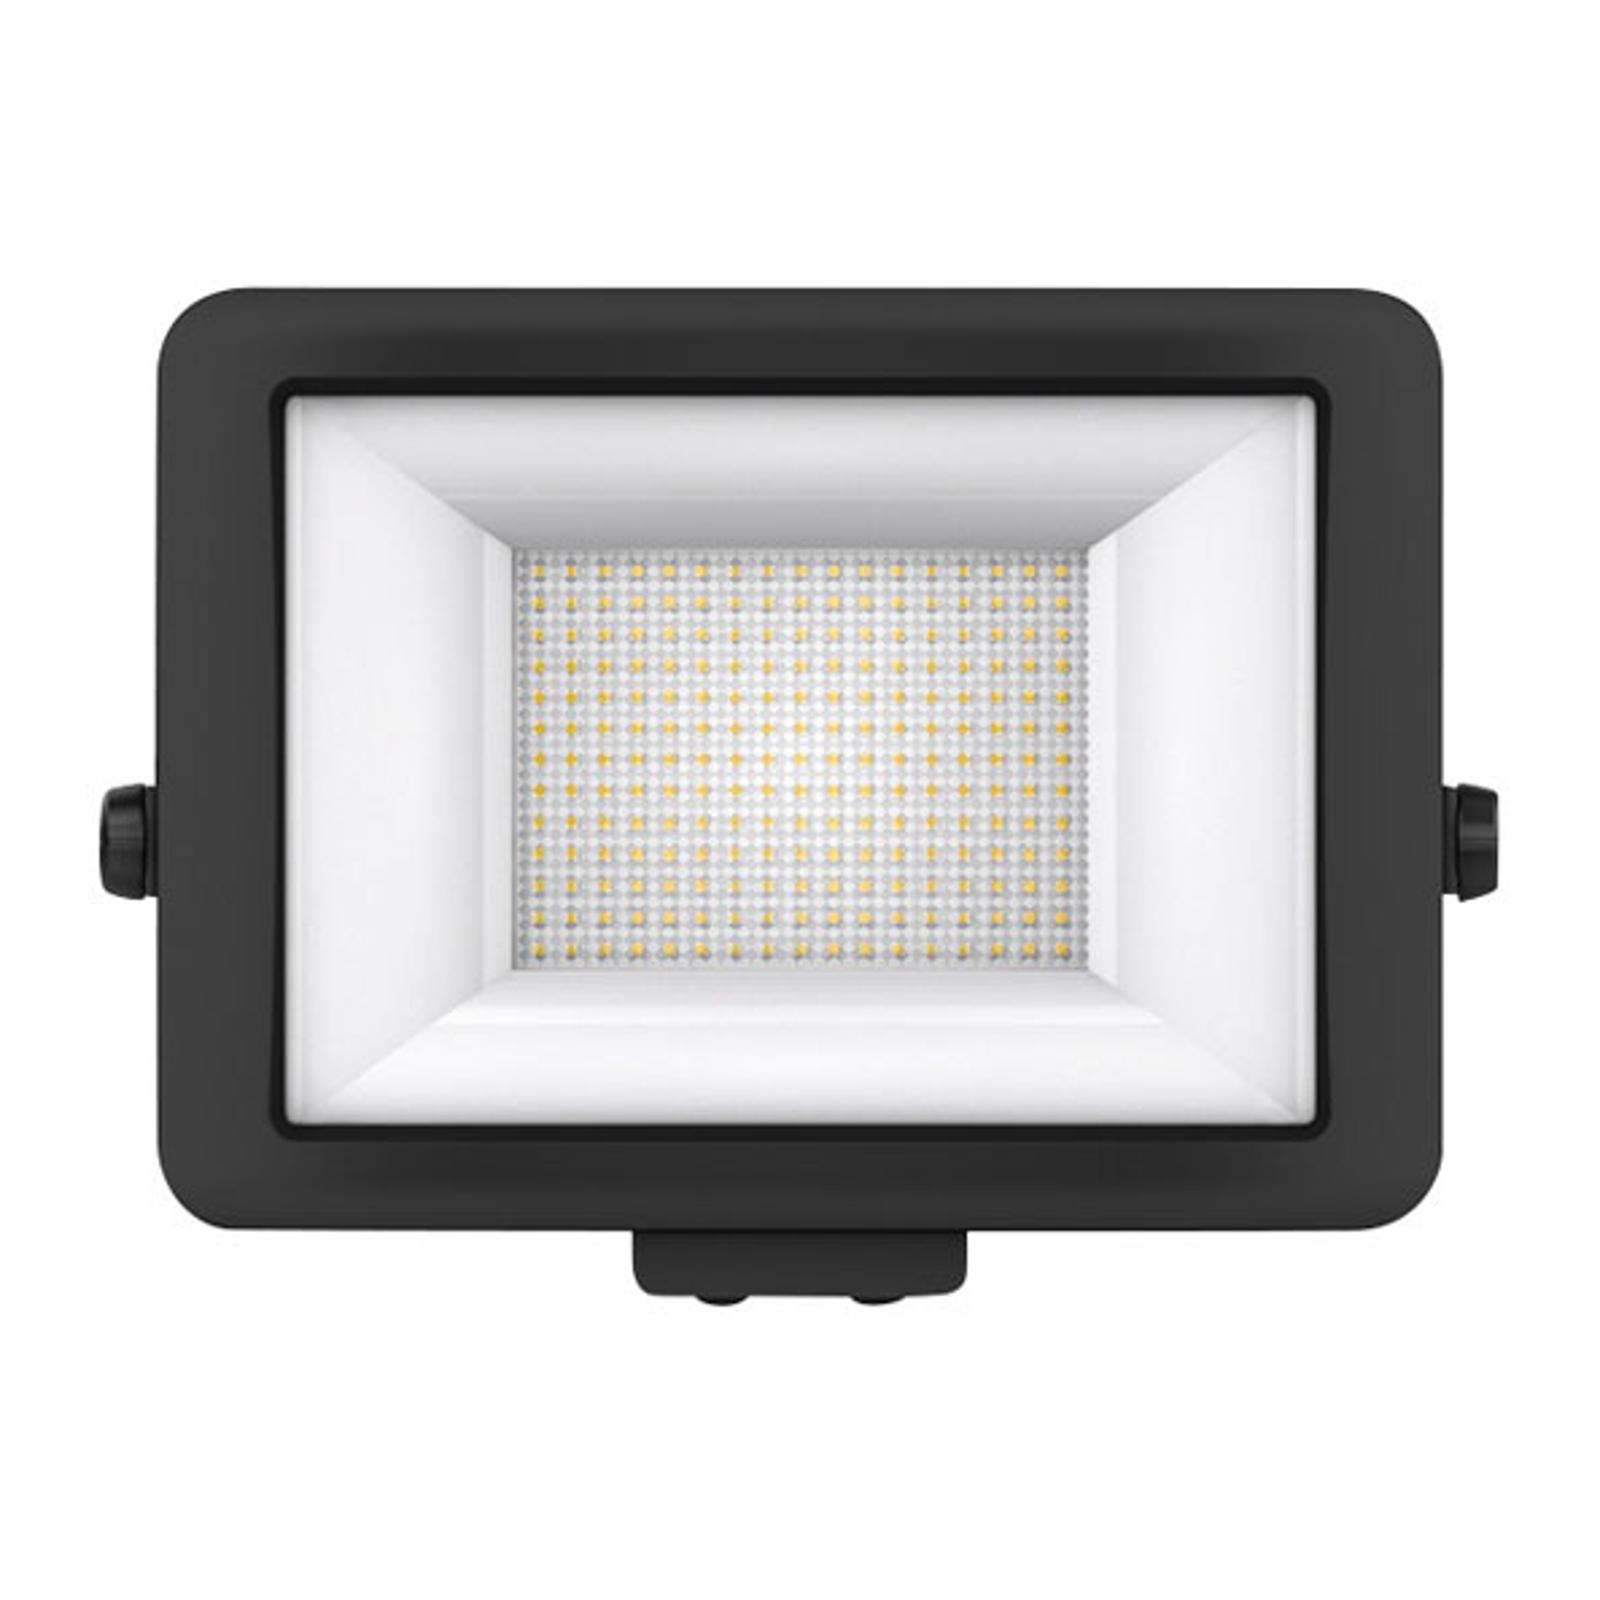 Theben theLeda B100L LED-Außenstrahler, schwarz